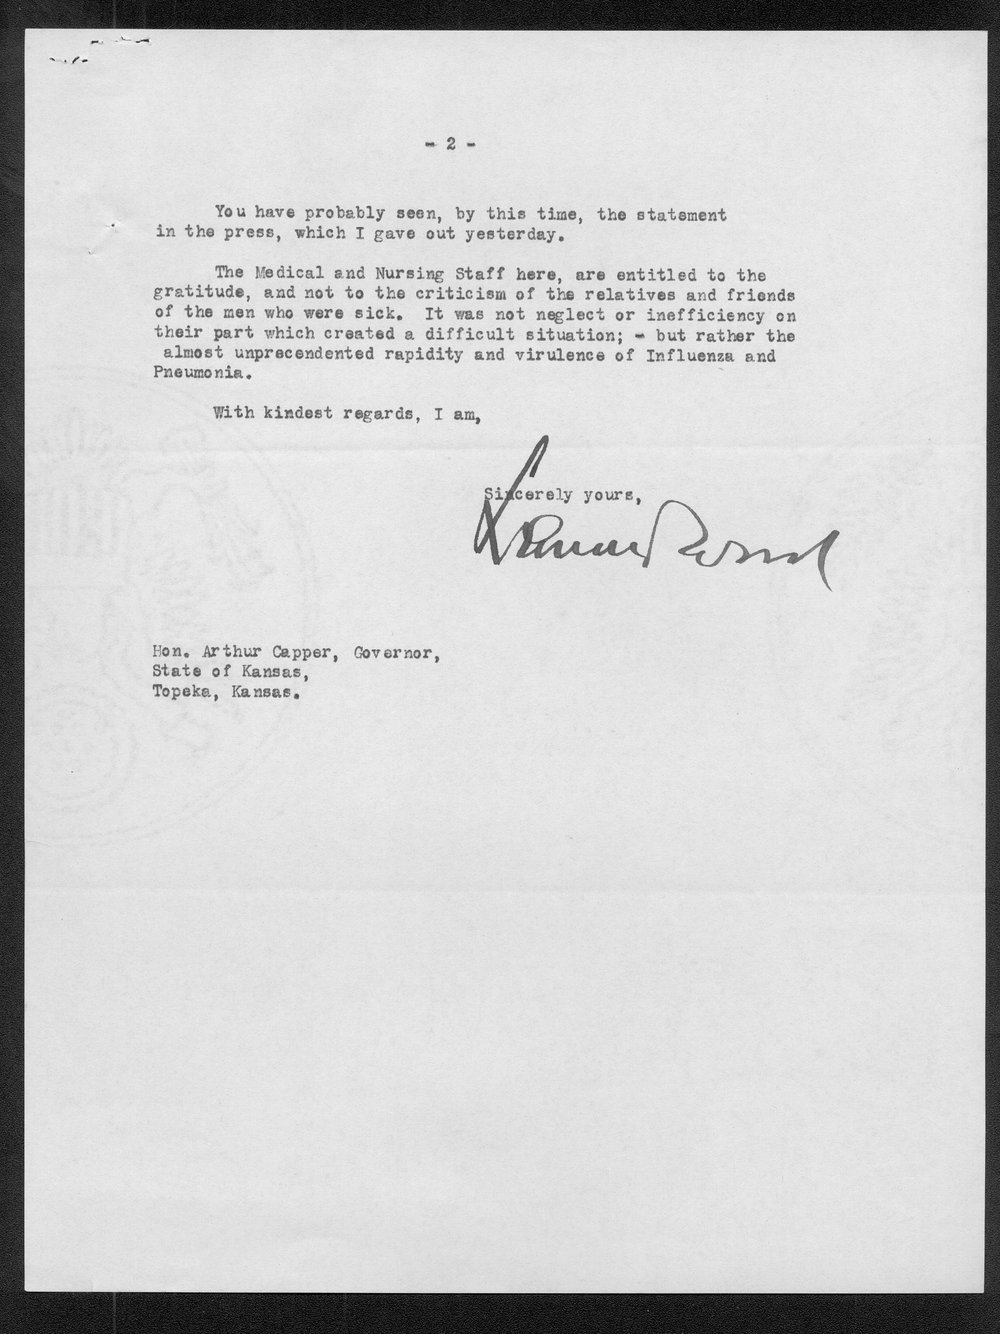 General Leonard Wood to Governor Arthur Capper - 2